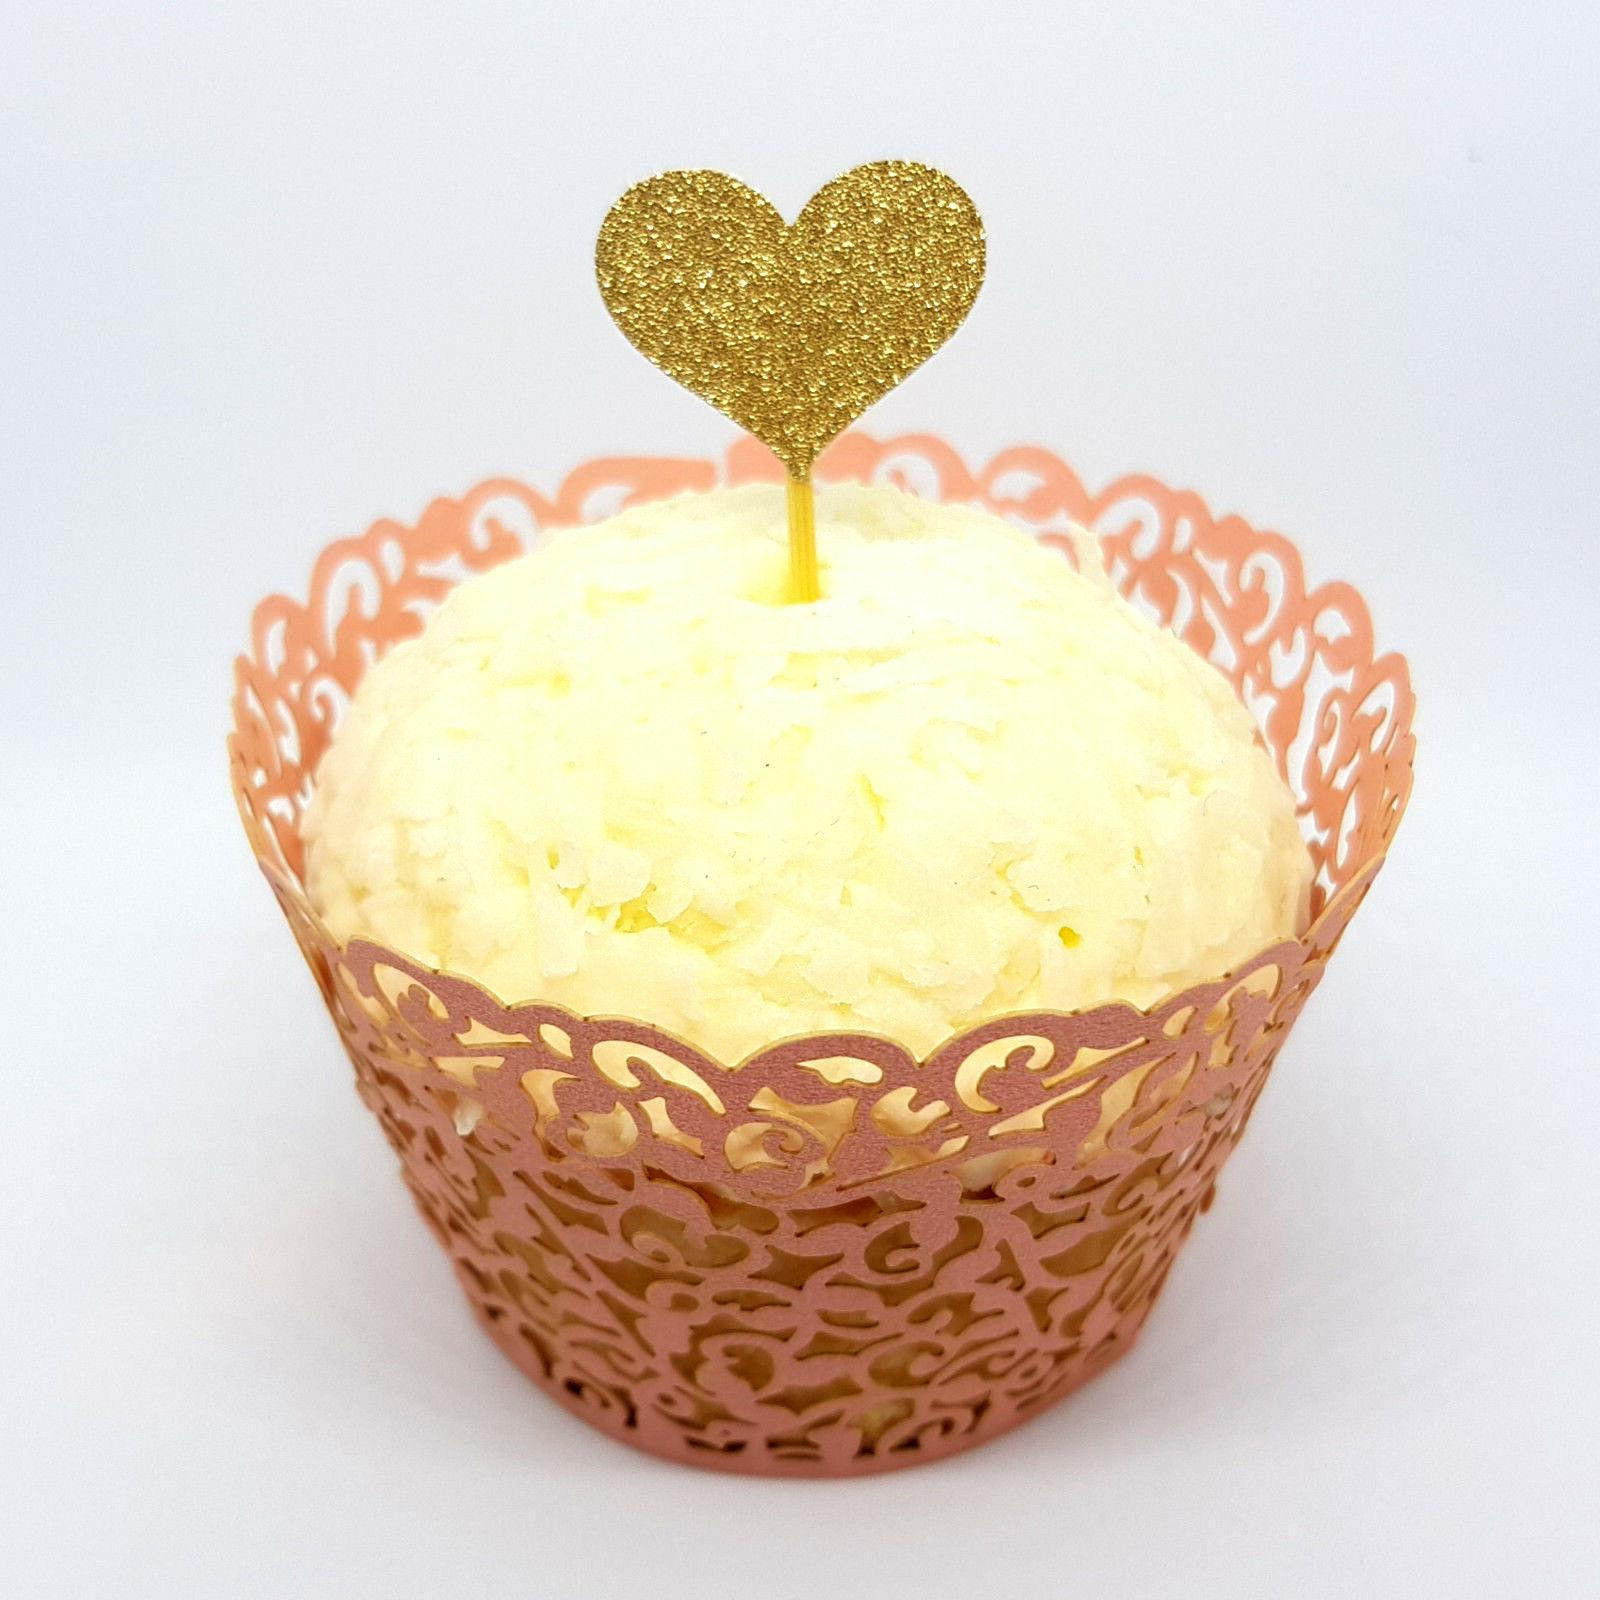 12 Gold Heart Cupcake & Wedding